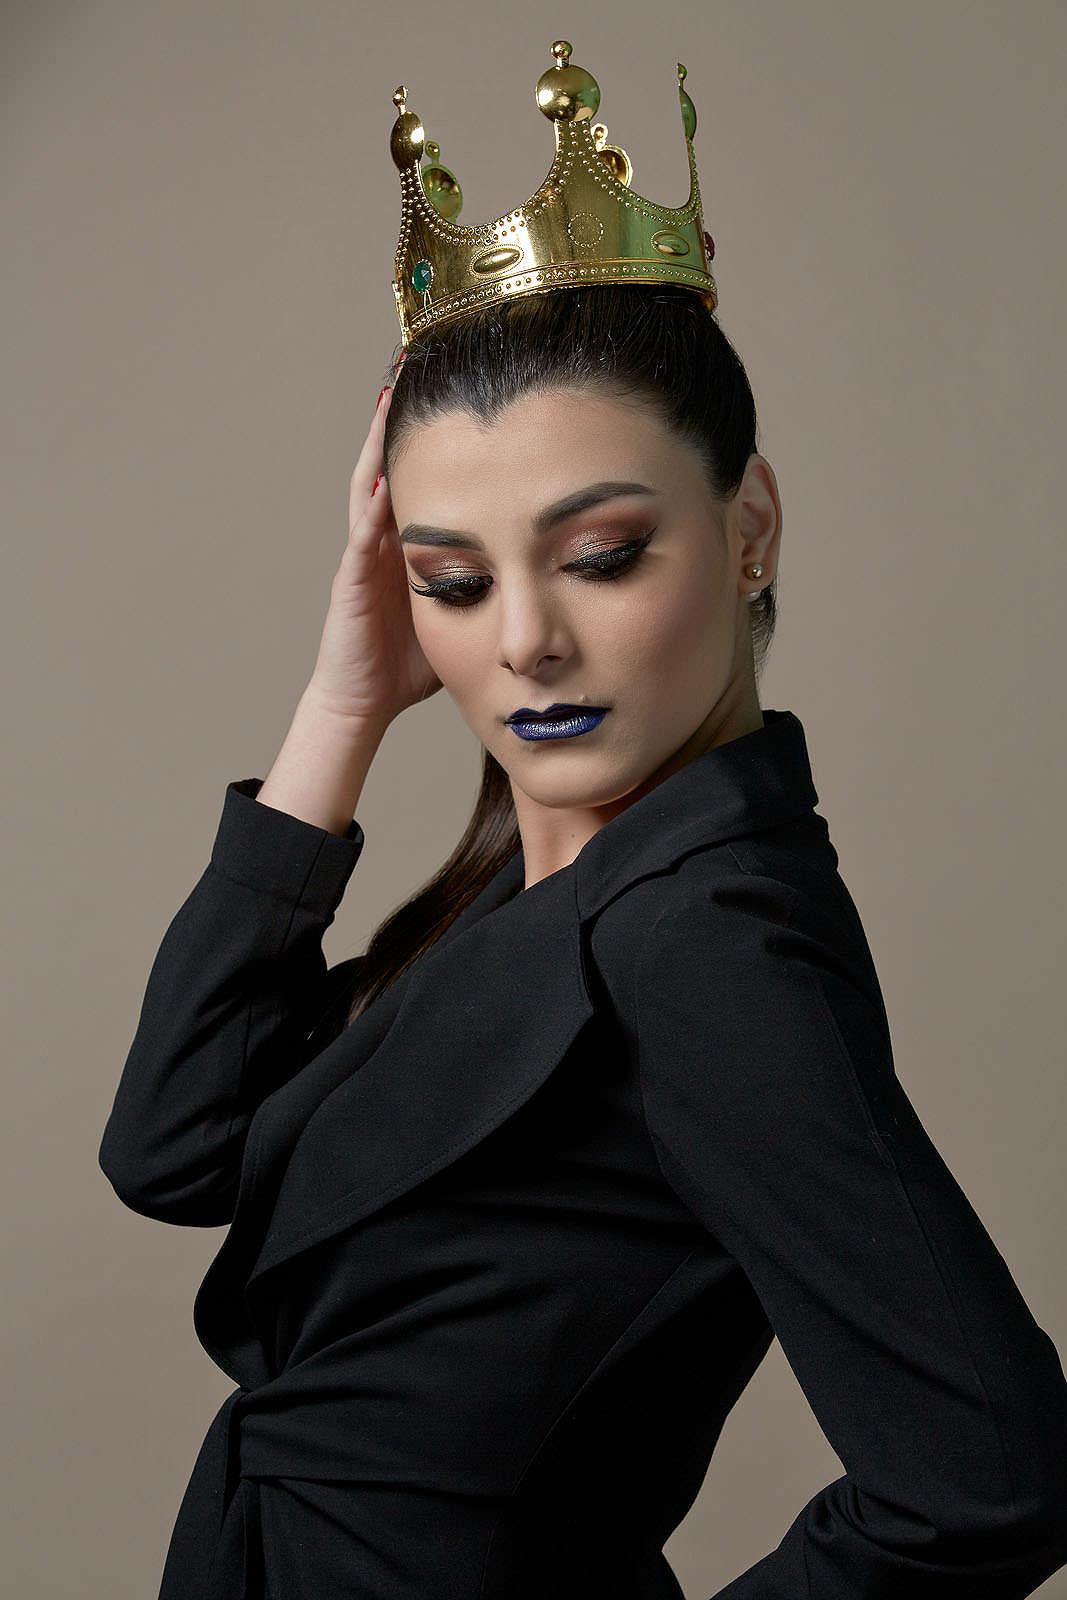 marcosvaldés FOTÓGRAFO® fashion and beauty photographer